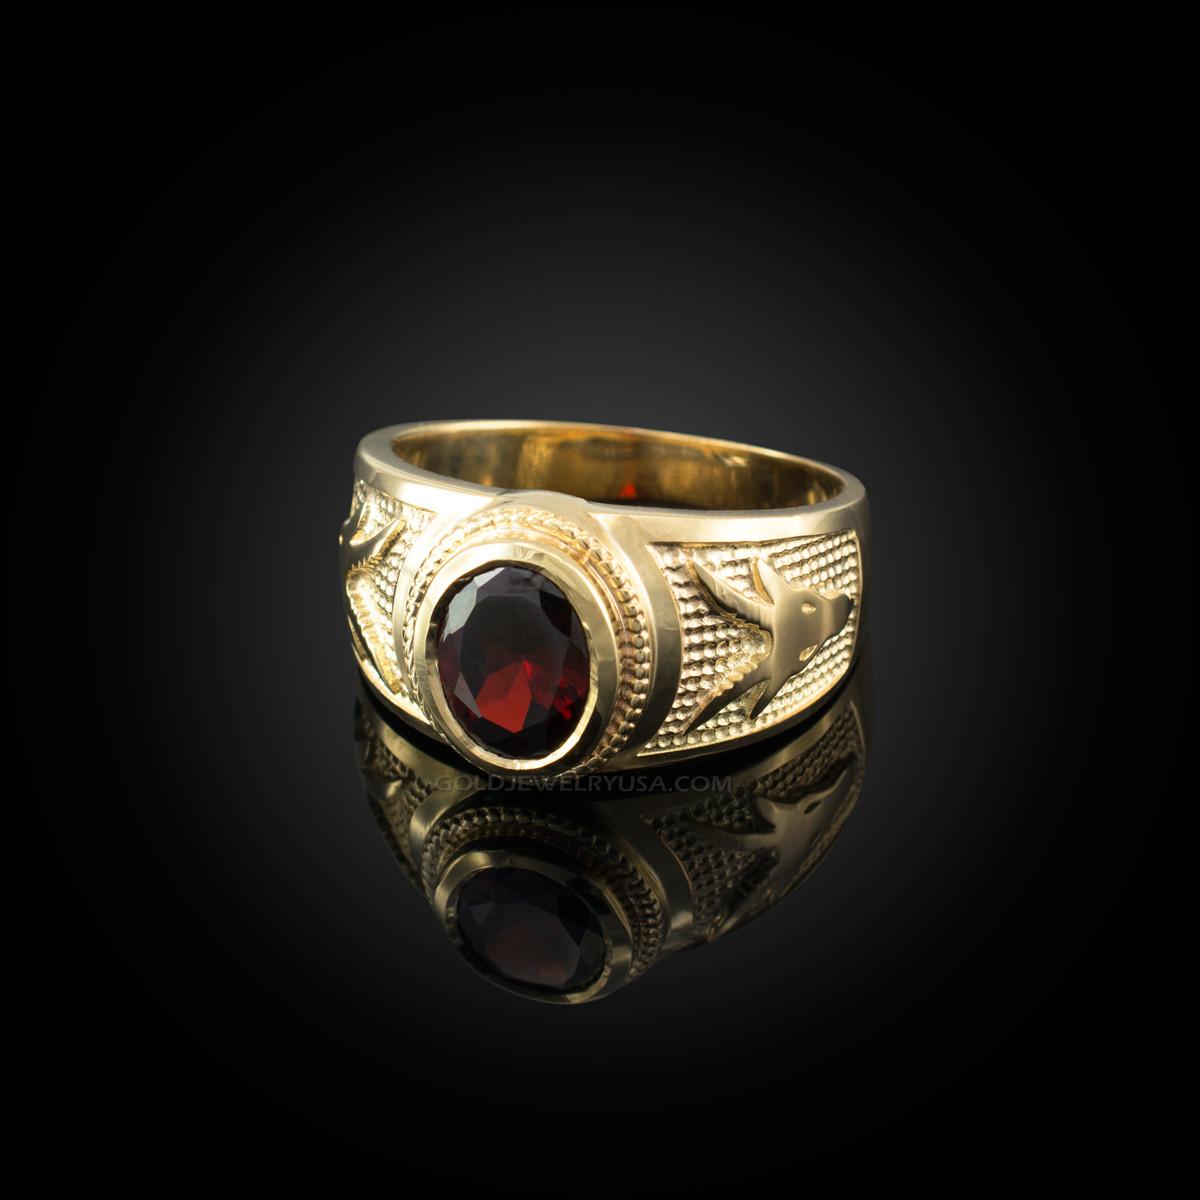 Capricorn 10k or 14k Solid Yellow Gold Zodiac CZ Ring